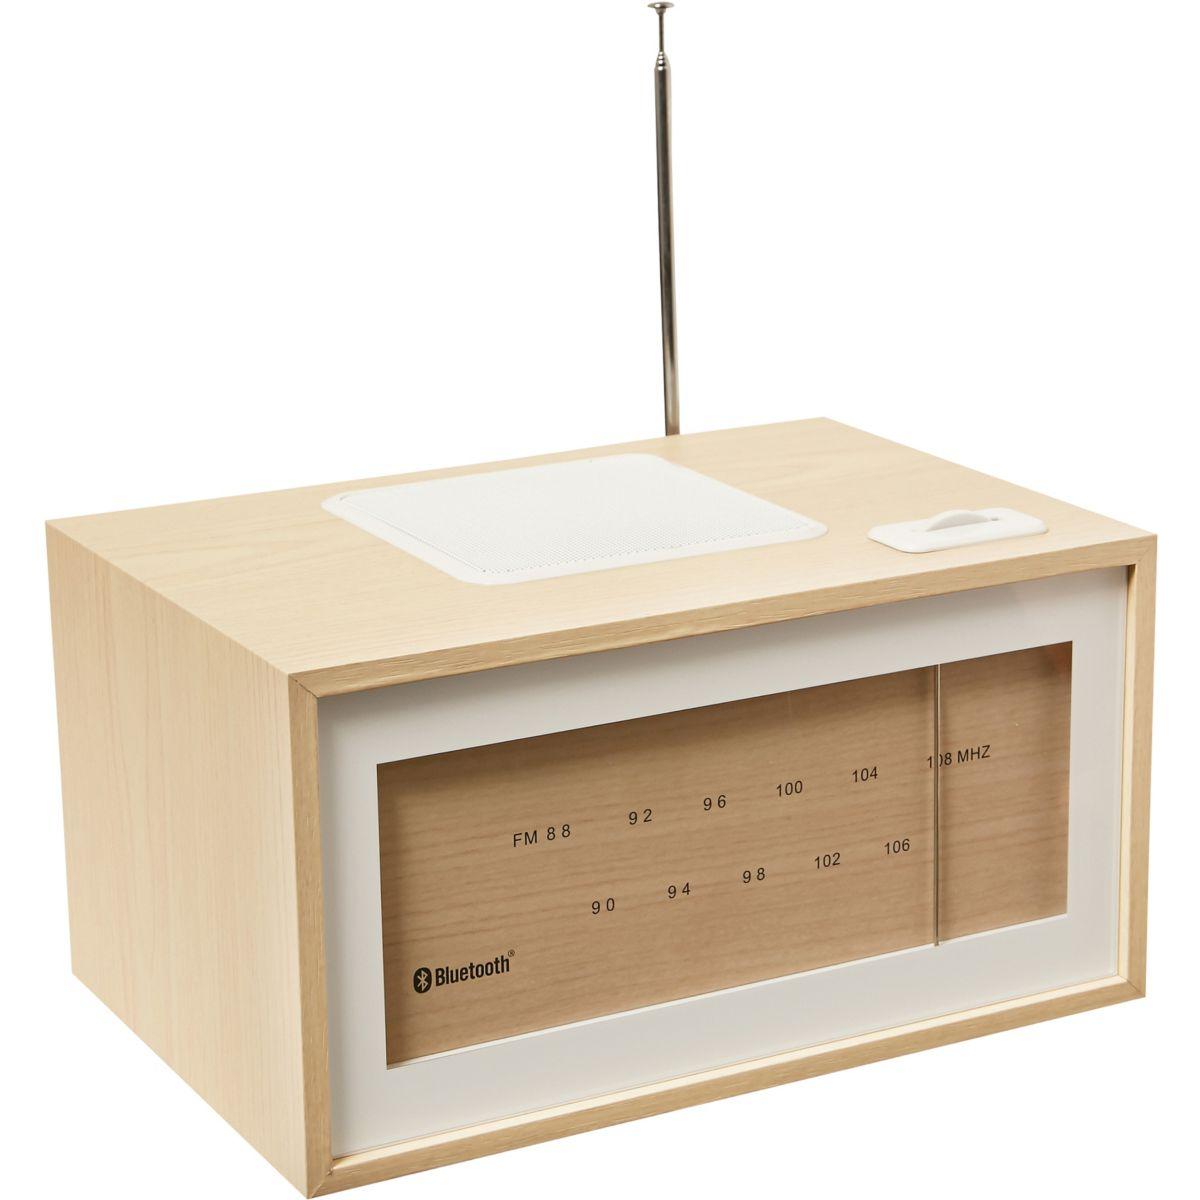 Radio analogique ESSENTIELB Be Trendy Bluetooth Bois Clair/Blanc